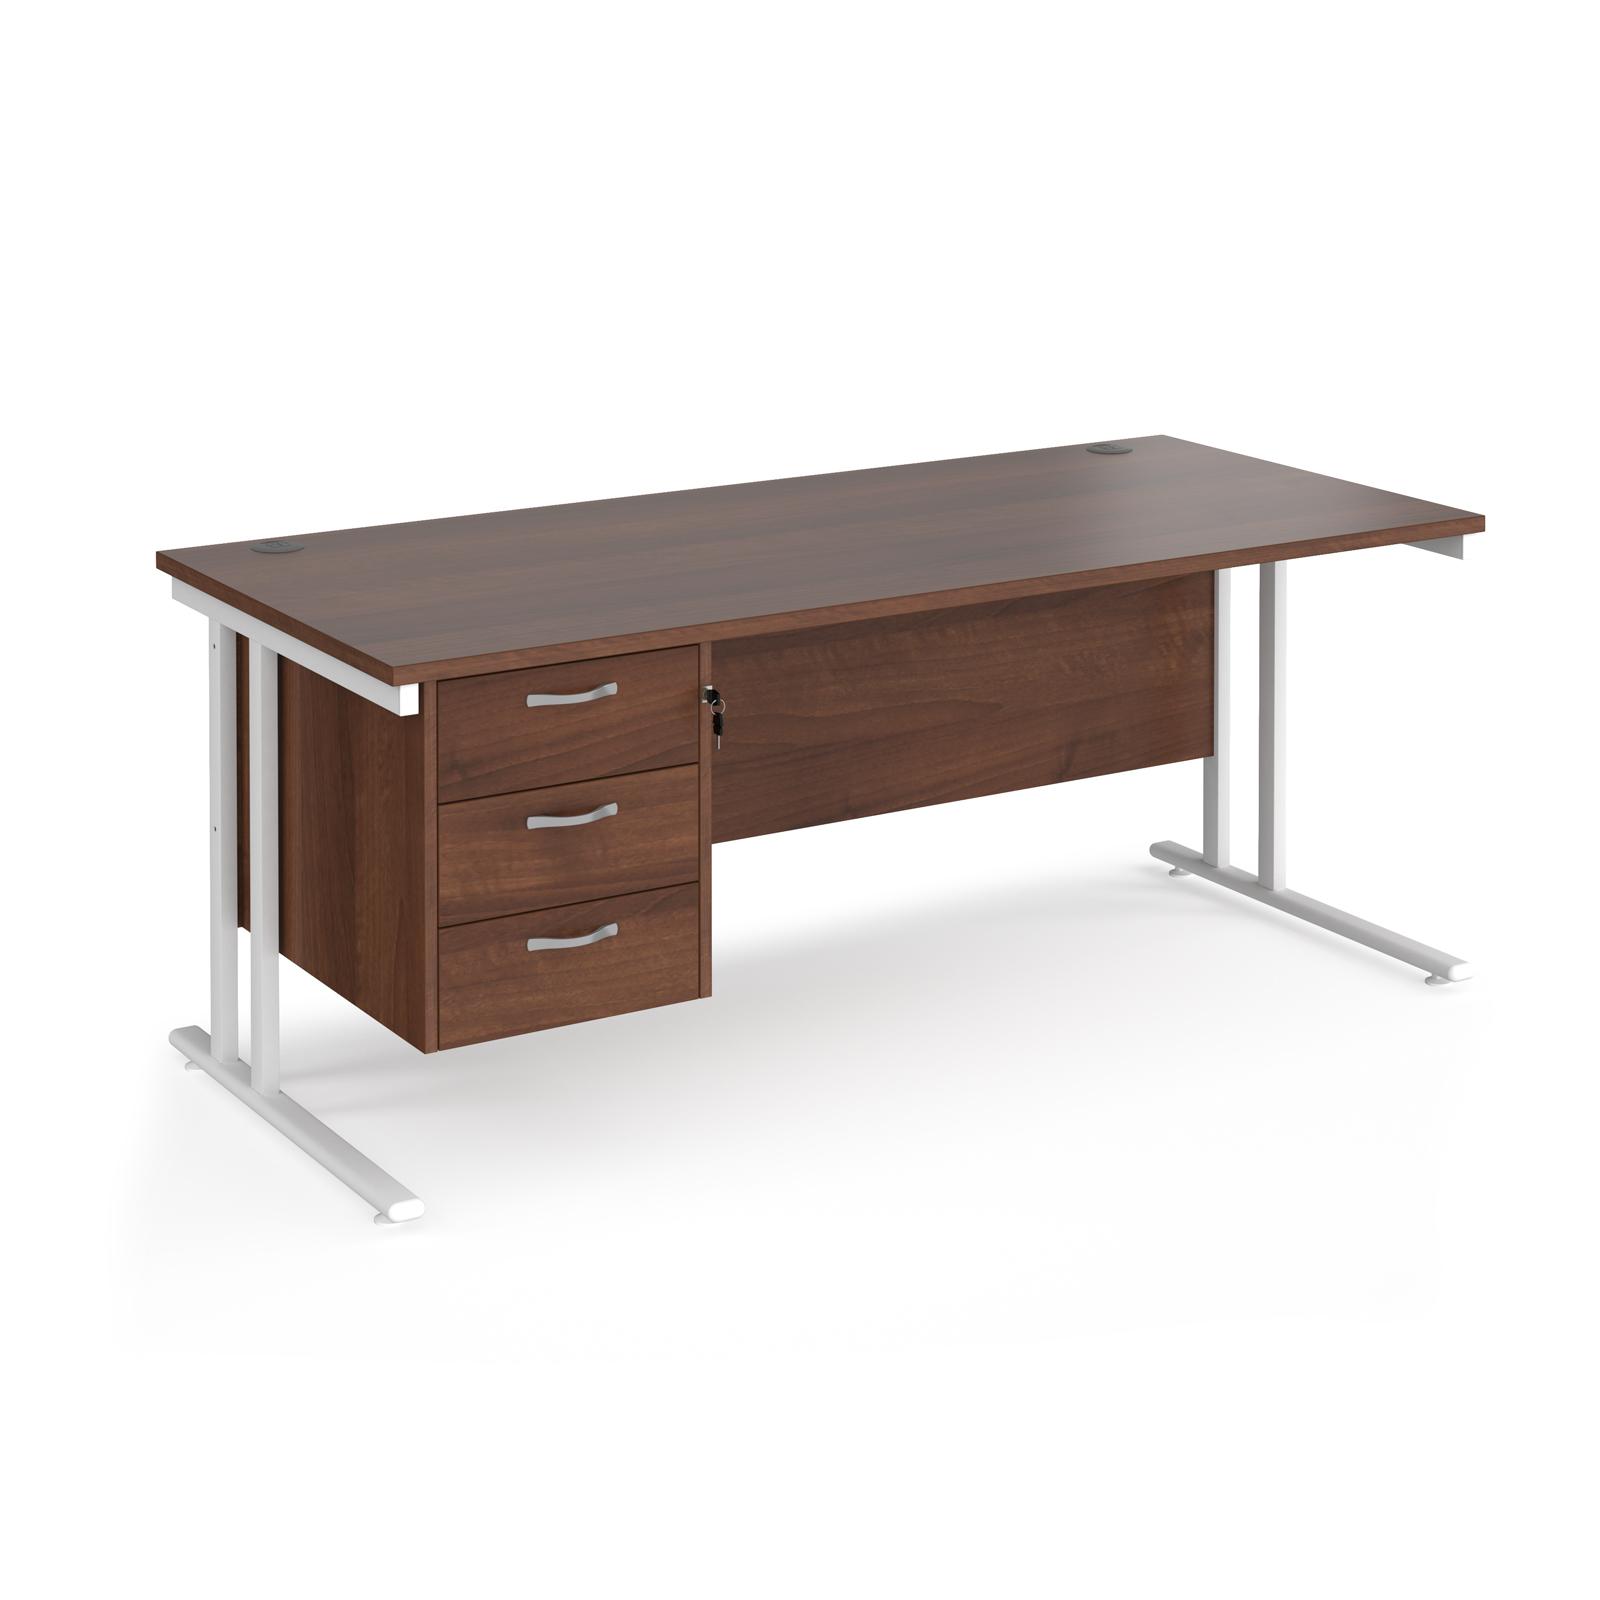 Rectangular Desks Maestro 25 straight desk 1800mm x 800mm with 3 drawer pedestal - white cantilever leg frame, walnut top